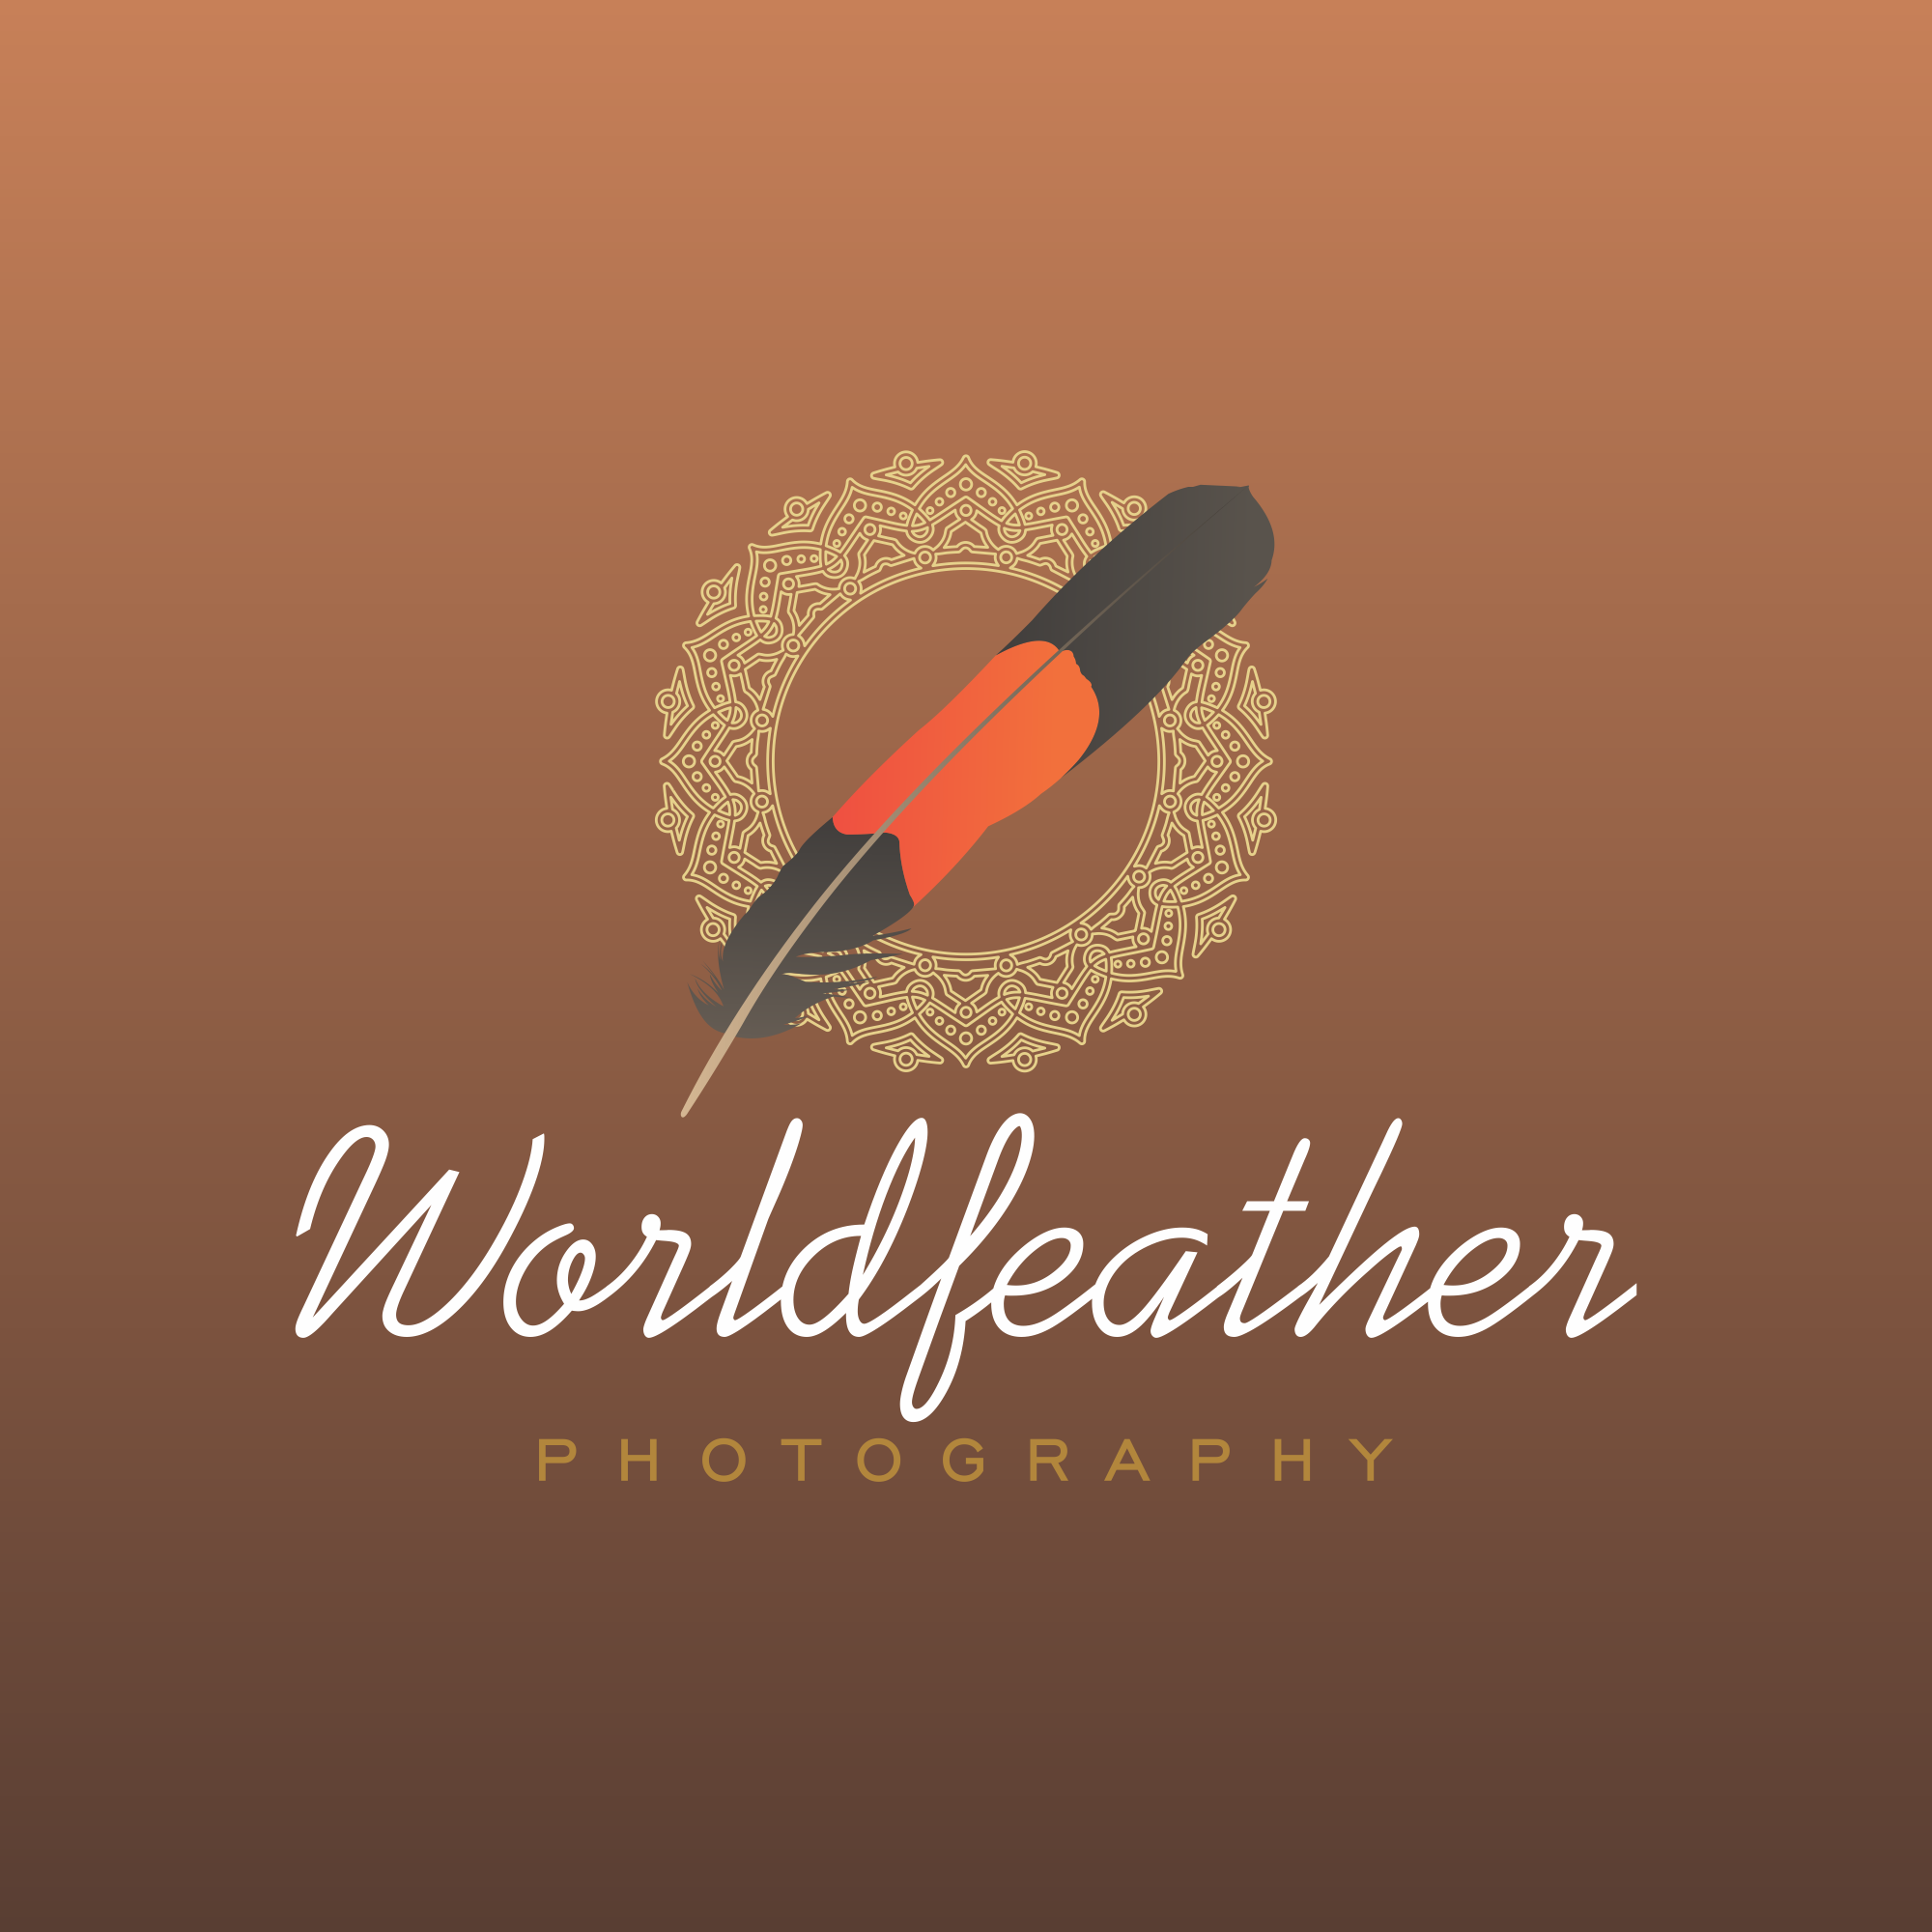 Elegant Earthy logo design for a portrait photographer who enjoys soulful moments captured in frame